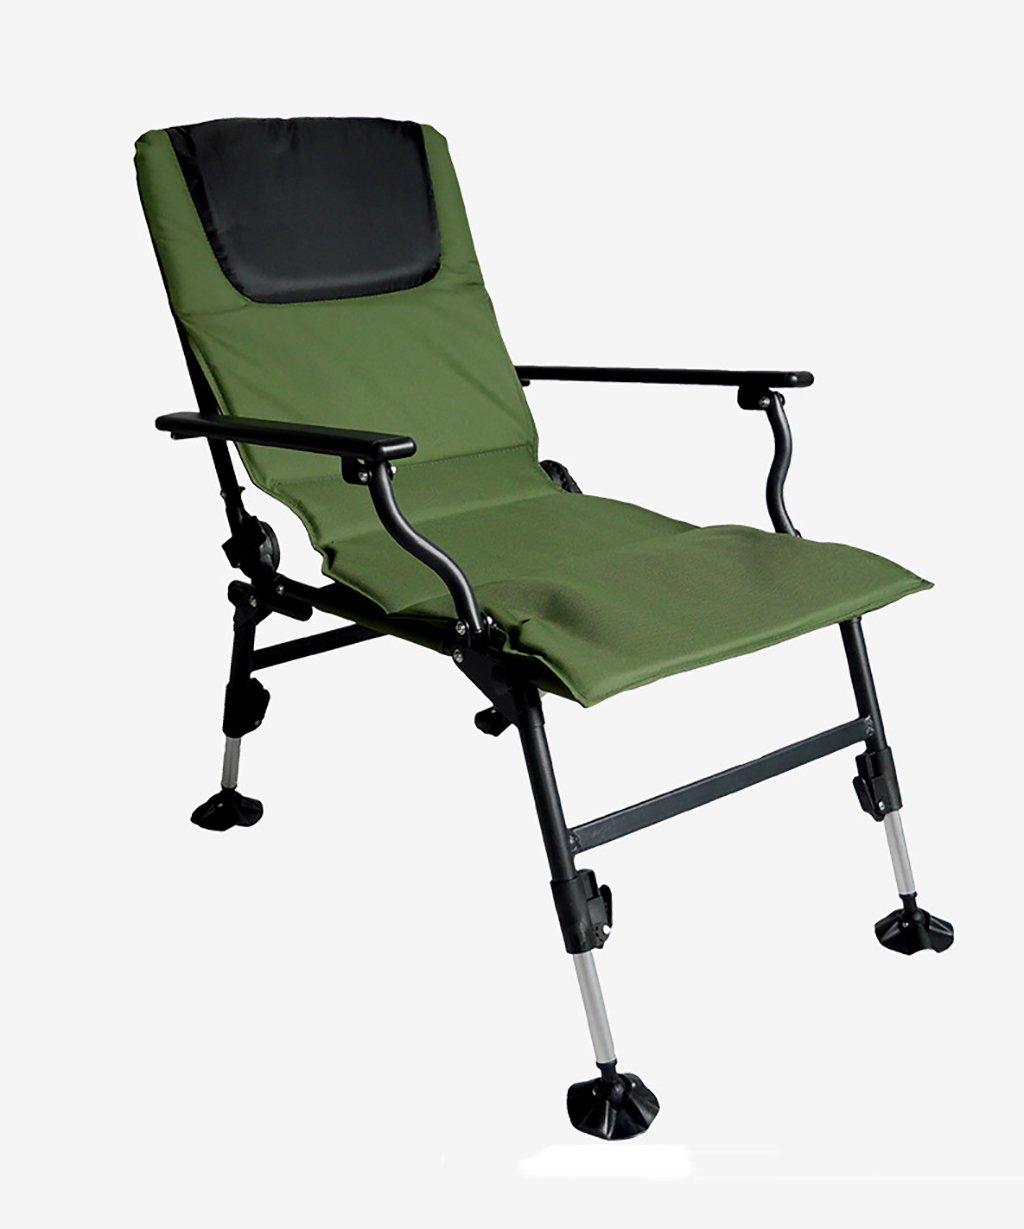 LIQICAI 釣り椅子 プロの陸軍グリーン折り畳み釣りの椅子ビーチチェア鯉の釣りアクセサリーガーデンパティオ屋外ポータブル チェア B078V8JVGW